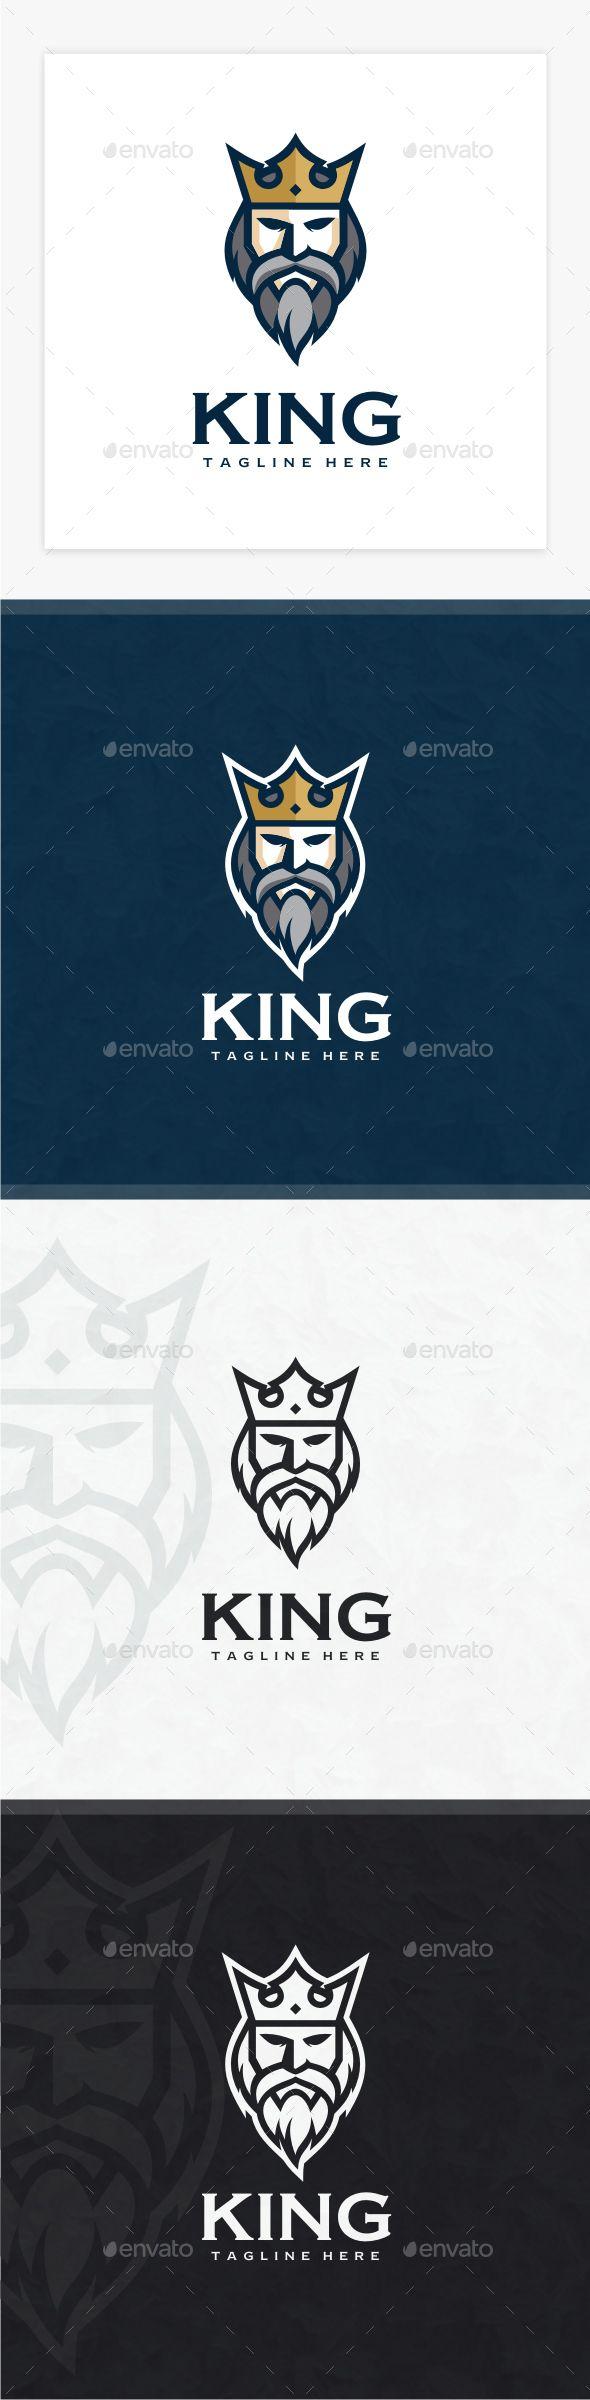 King Logo - Humans Logo Templates Download here : https://graphicriver.net/item/king-logo/19222474?s_rank=80&ref=Al-fatih